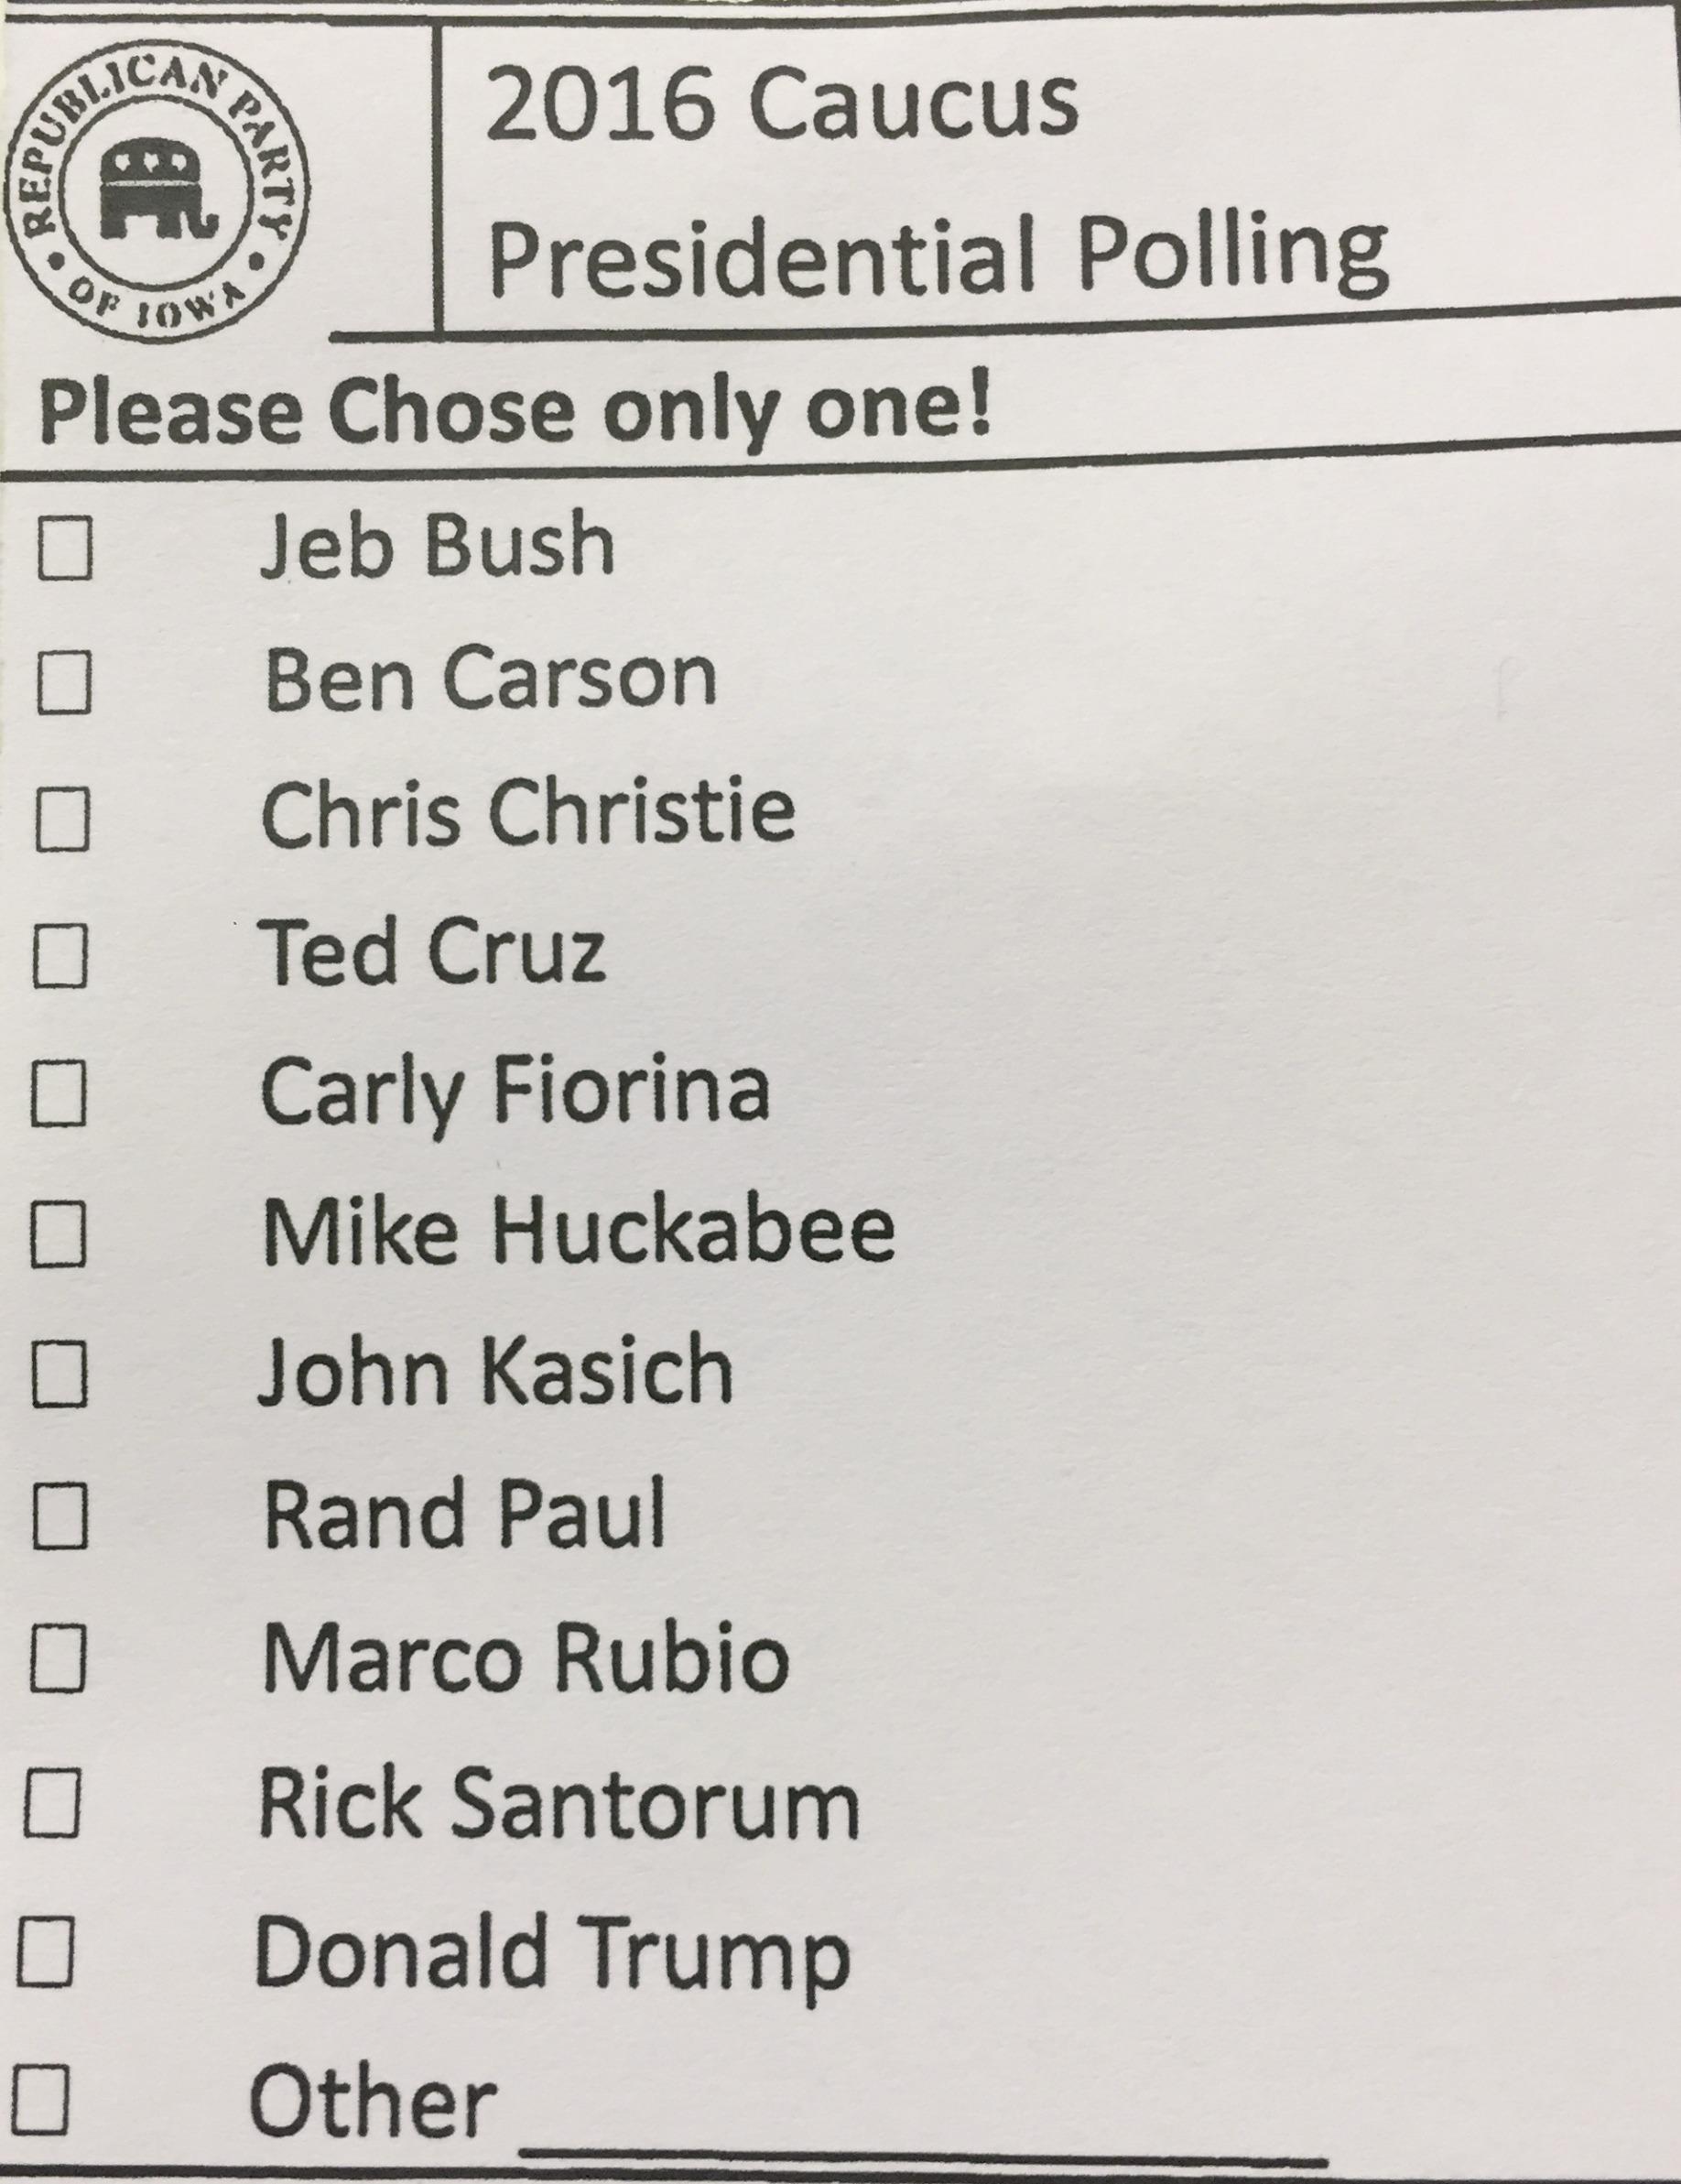 presidential polling my first iowa caucus My First Iowa Caucus